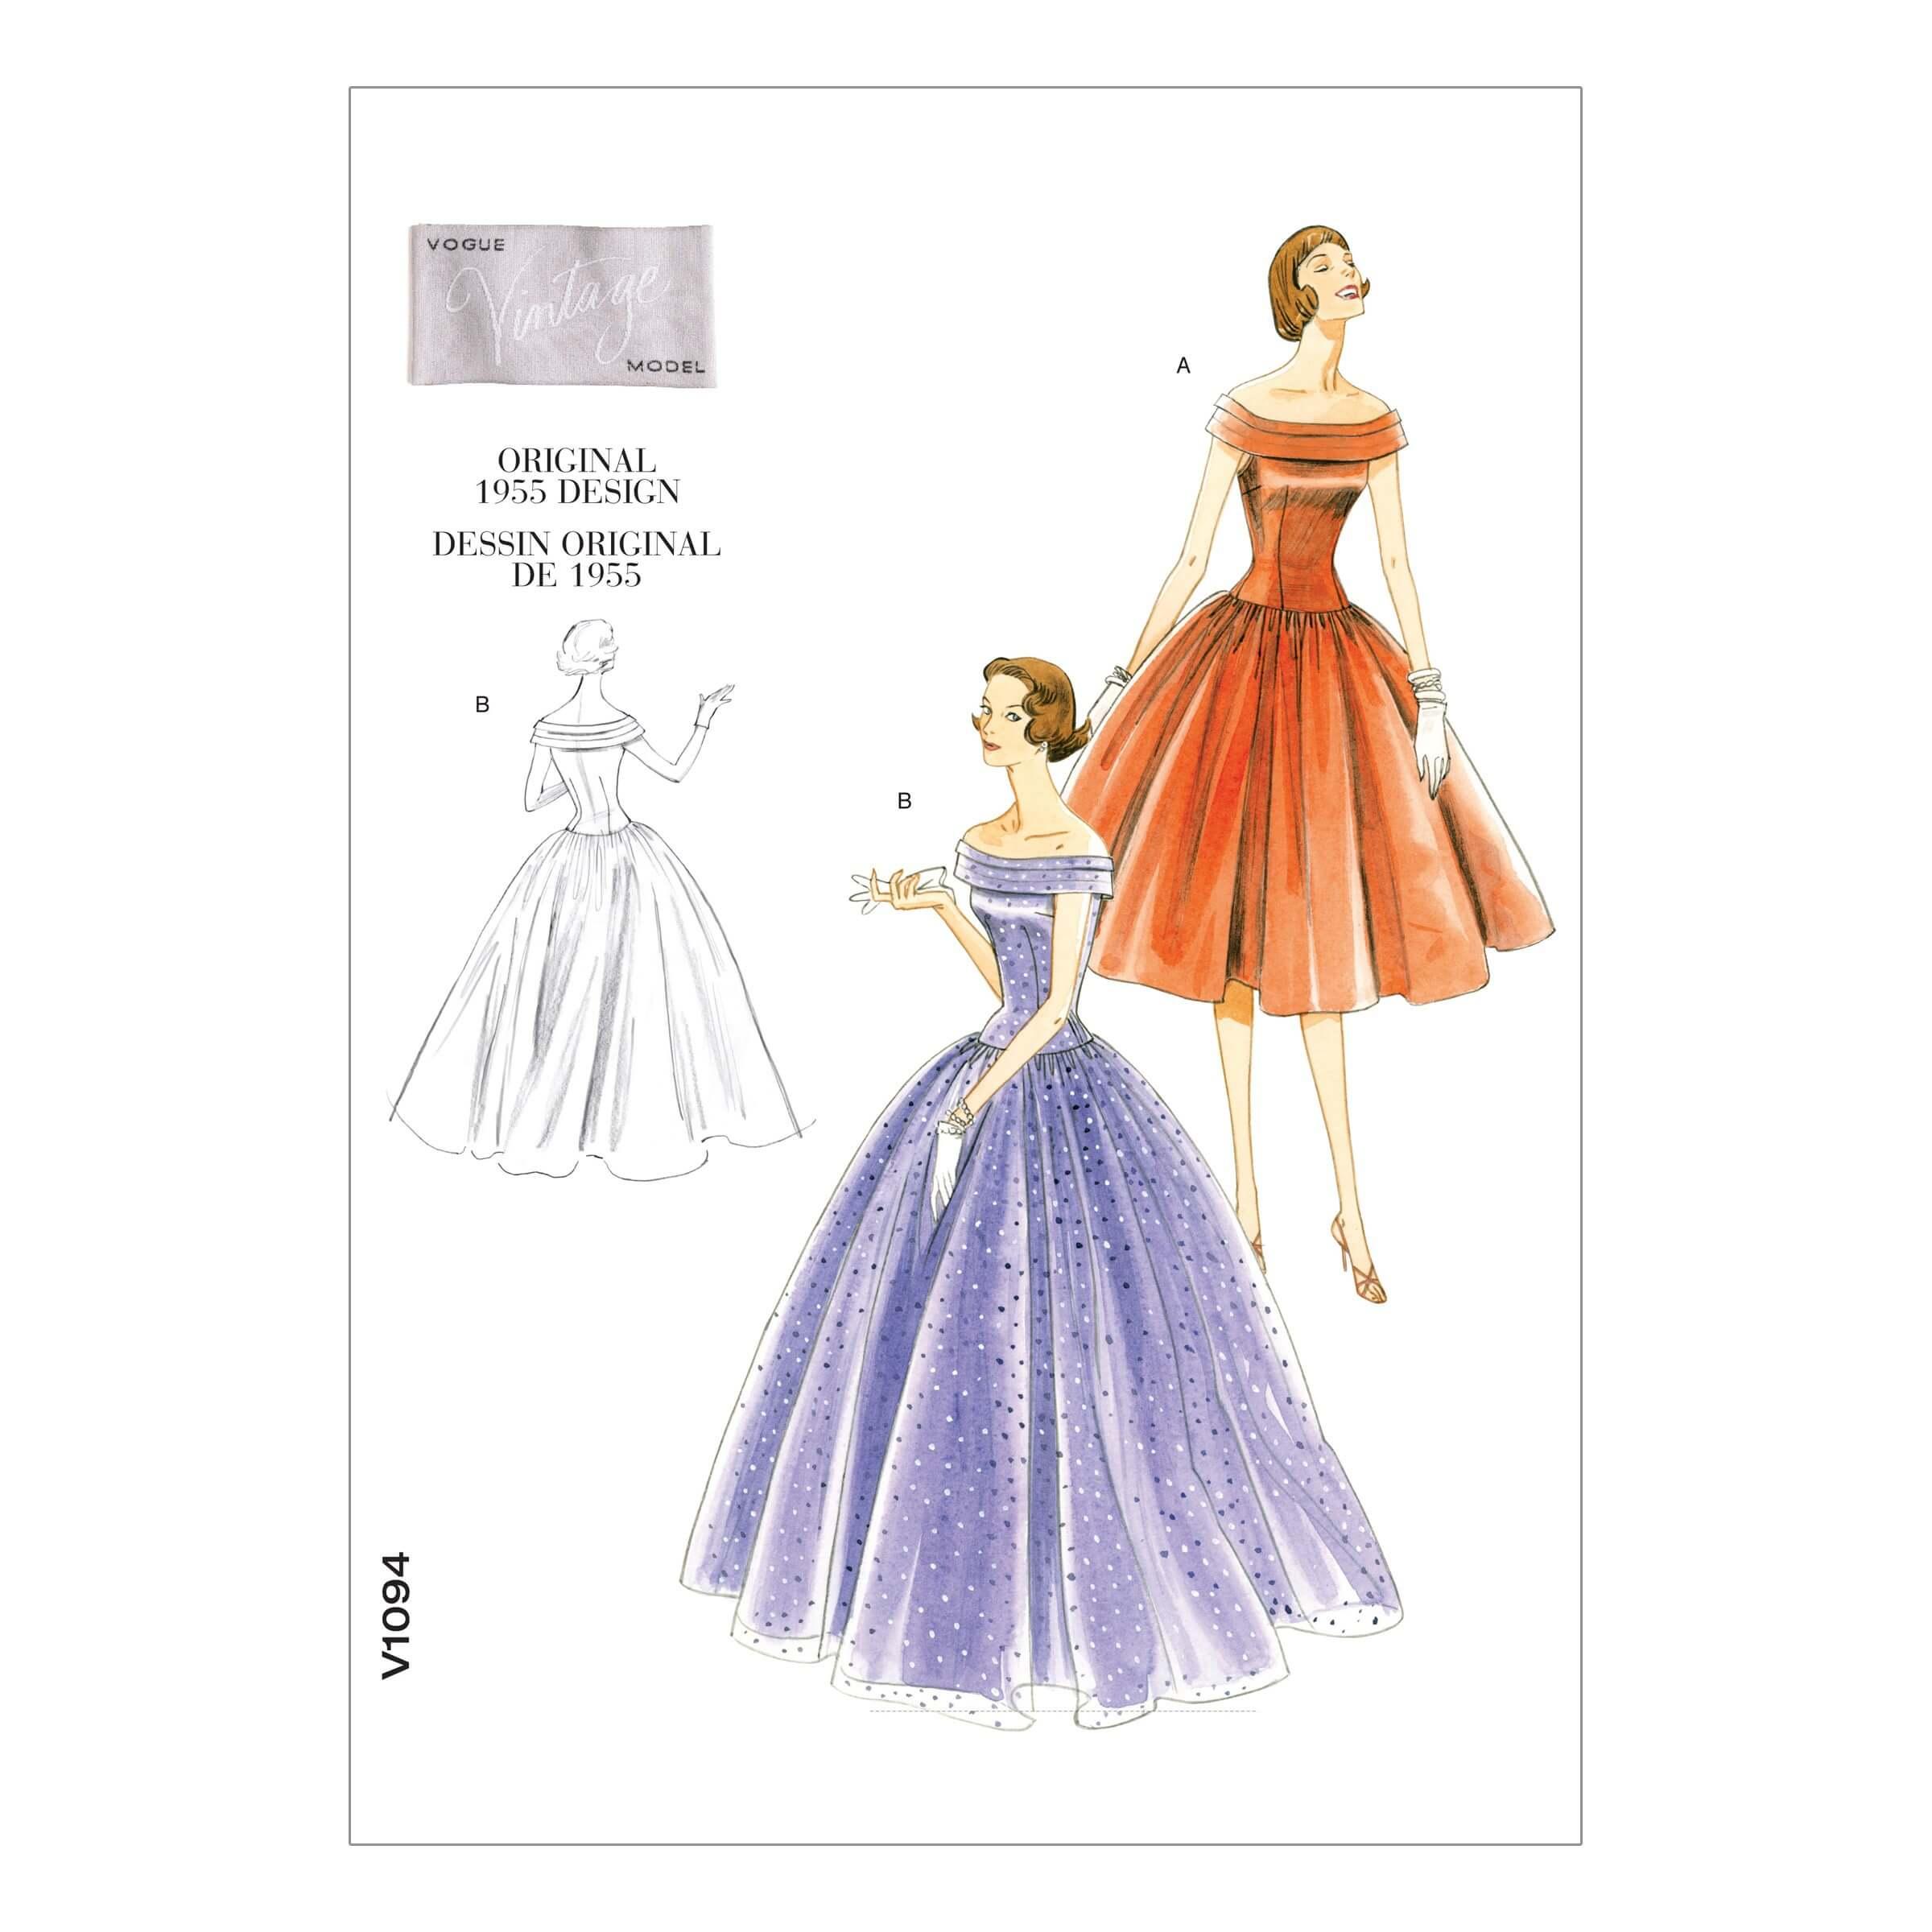 Vogue Sewing Pattern V1094 Women's Vintage 1950s Ballgown Dress Occasion